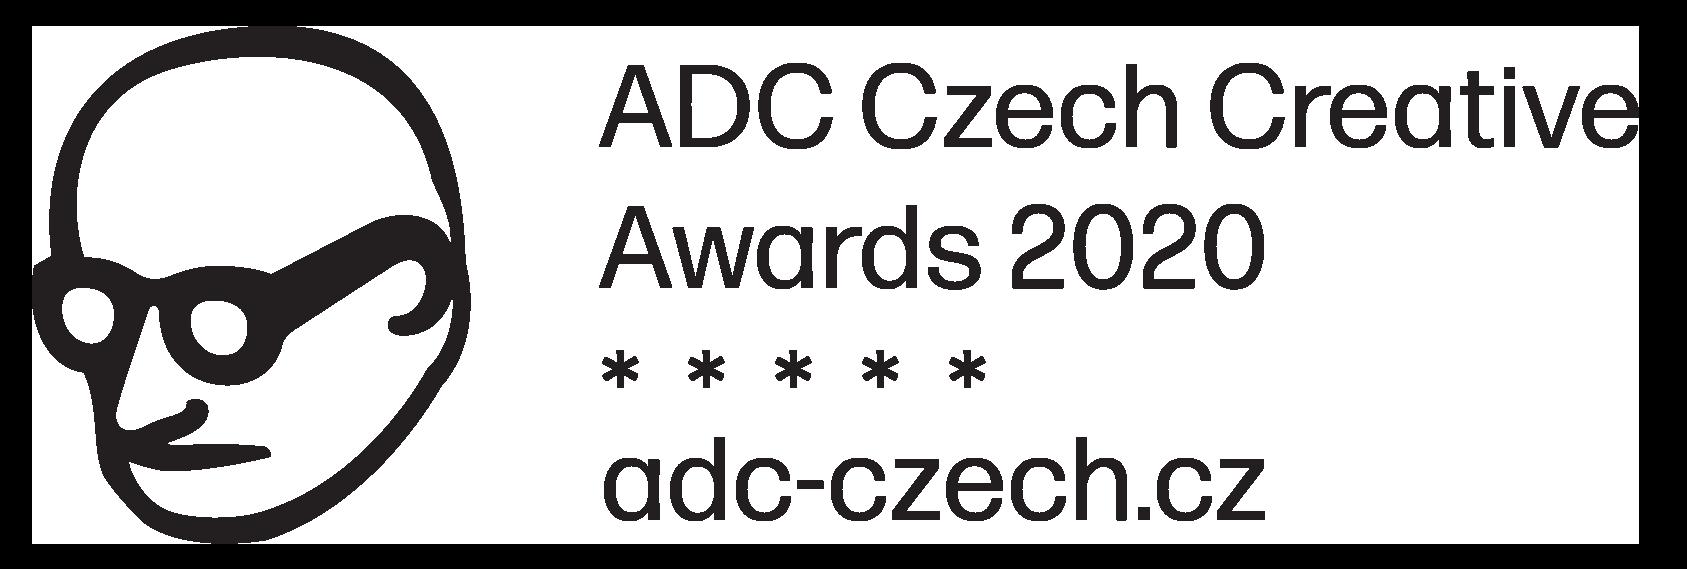 ADC Czech Creative Awards